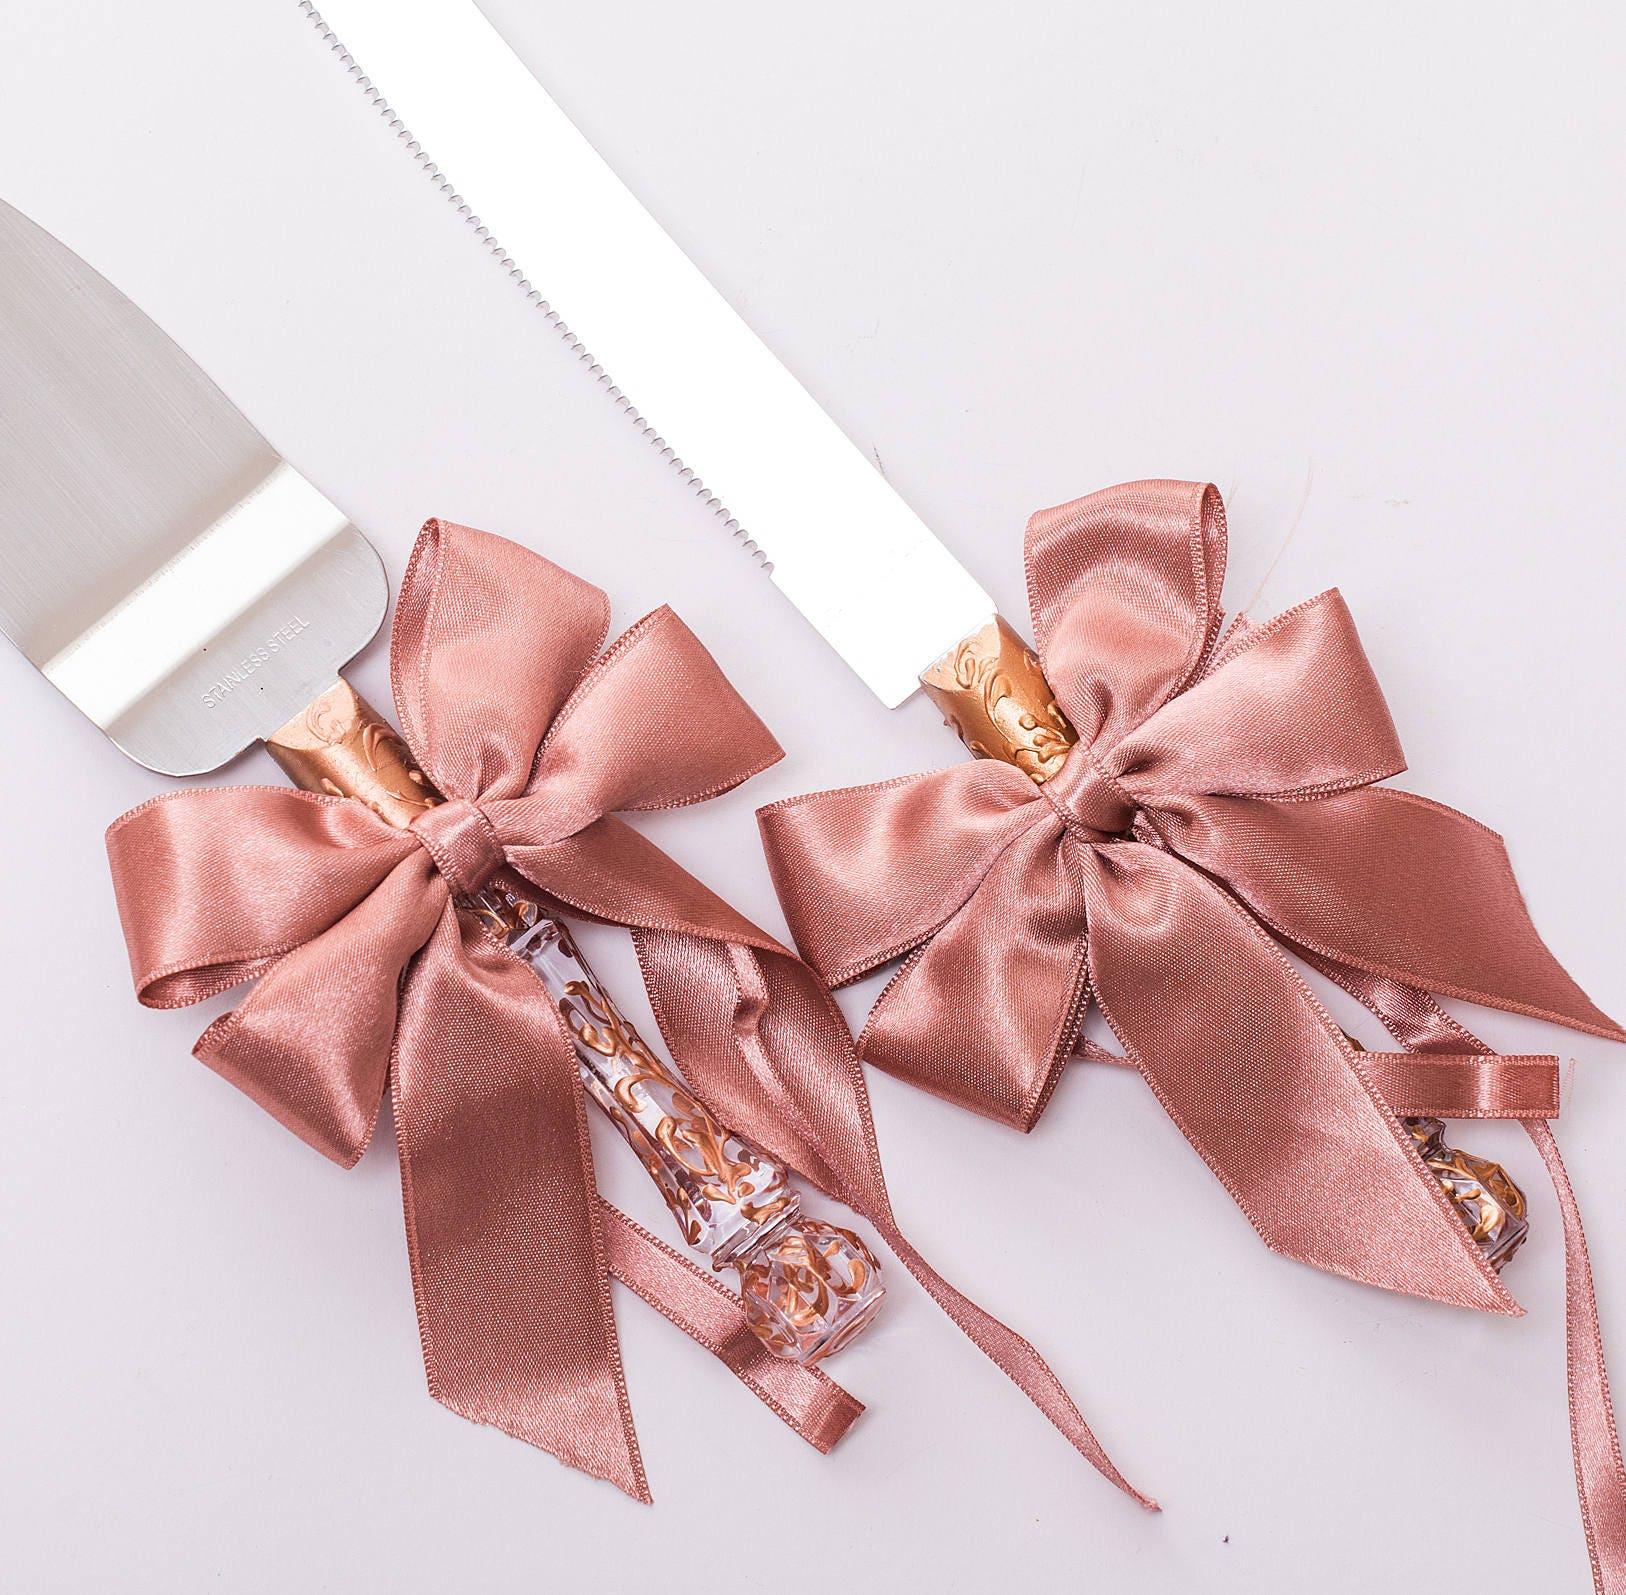 ROSE GOLD wedding cake server set rose gold Wedding rose gold | Etsy